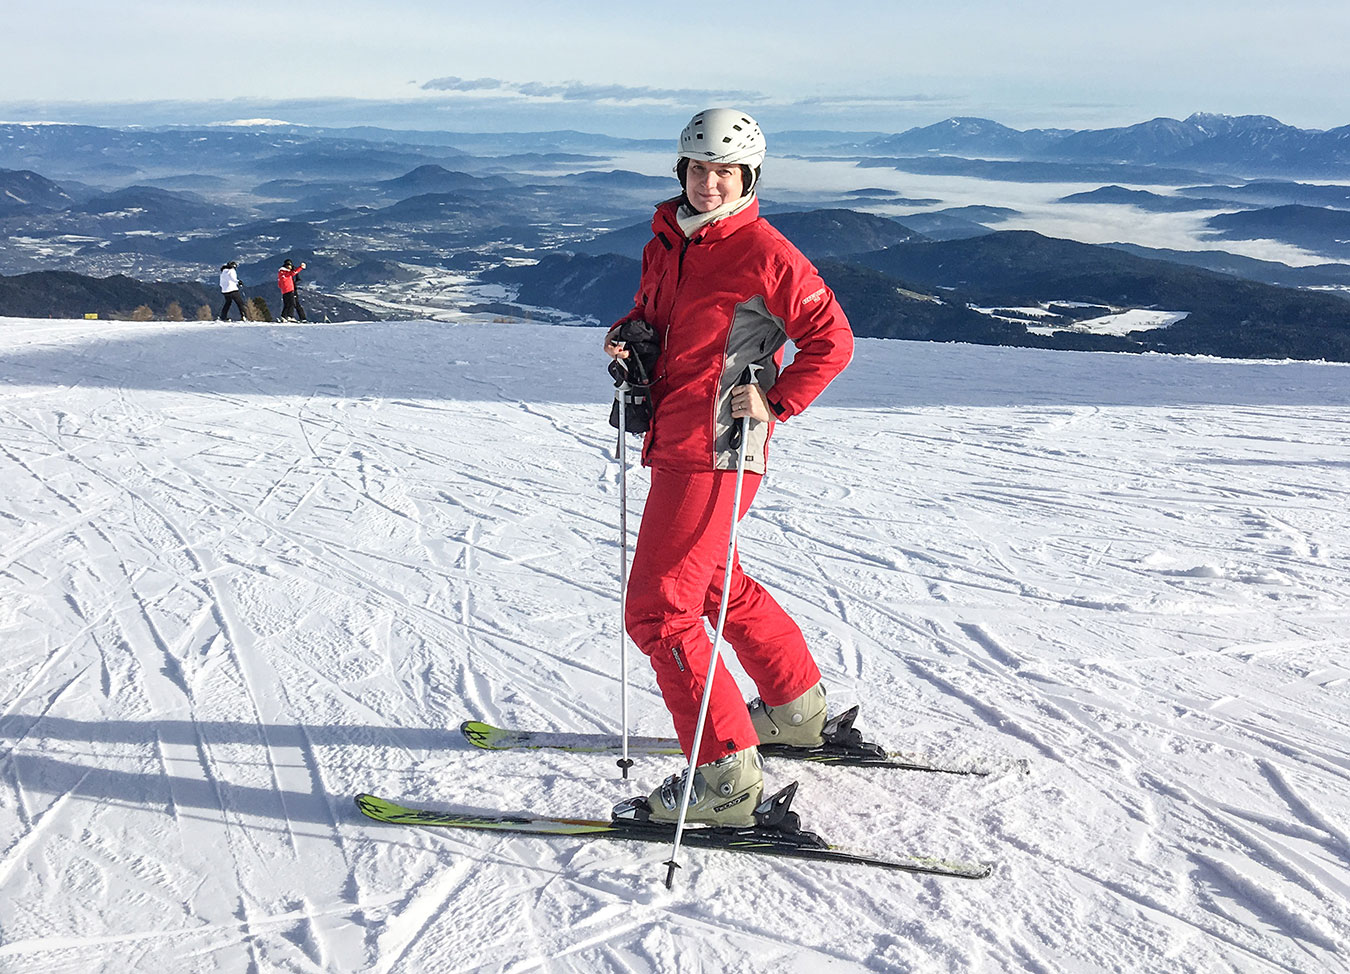 a-elisabeth-ellison-kramer-skiing-austrian-alps.jpg